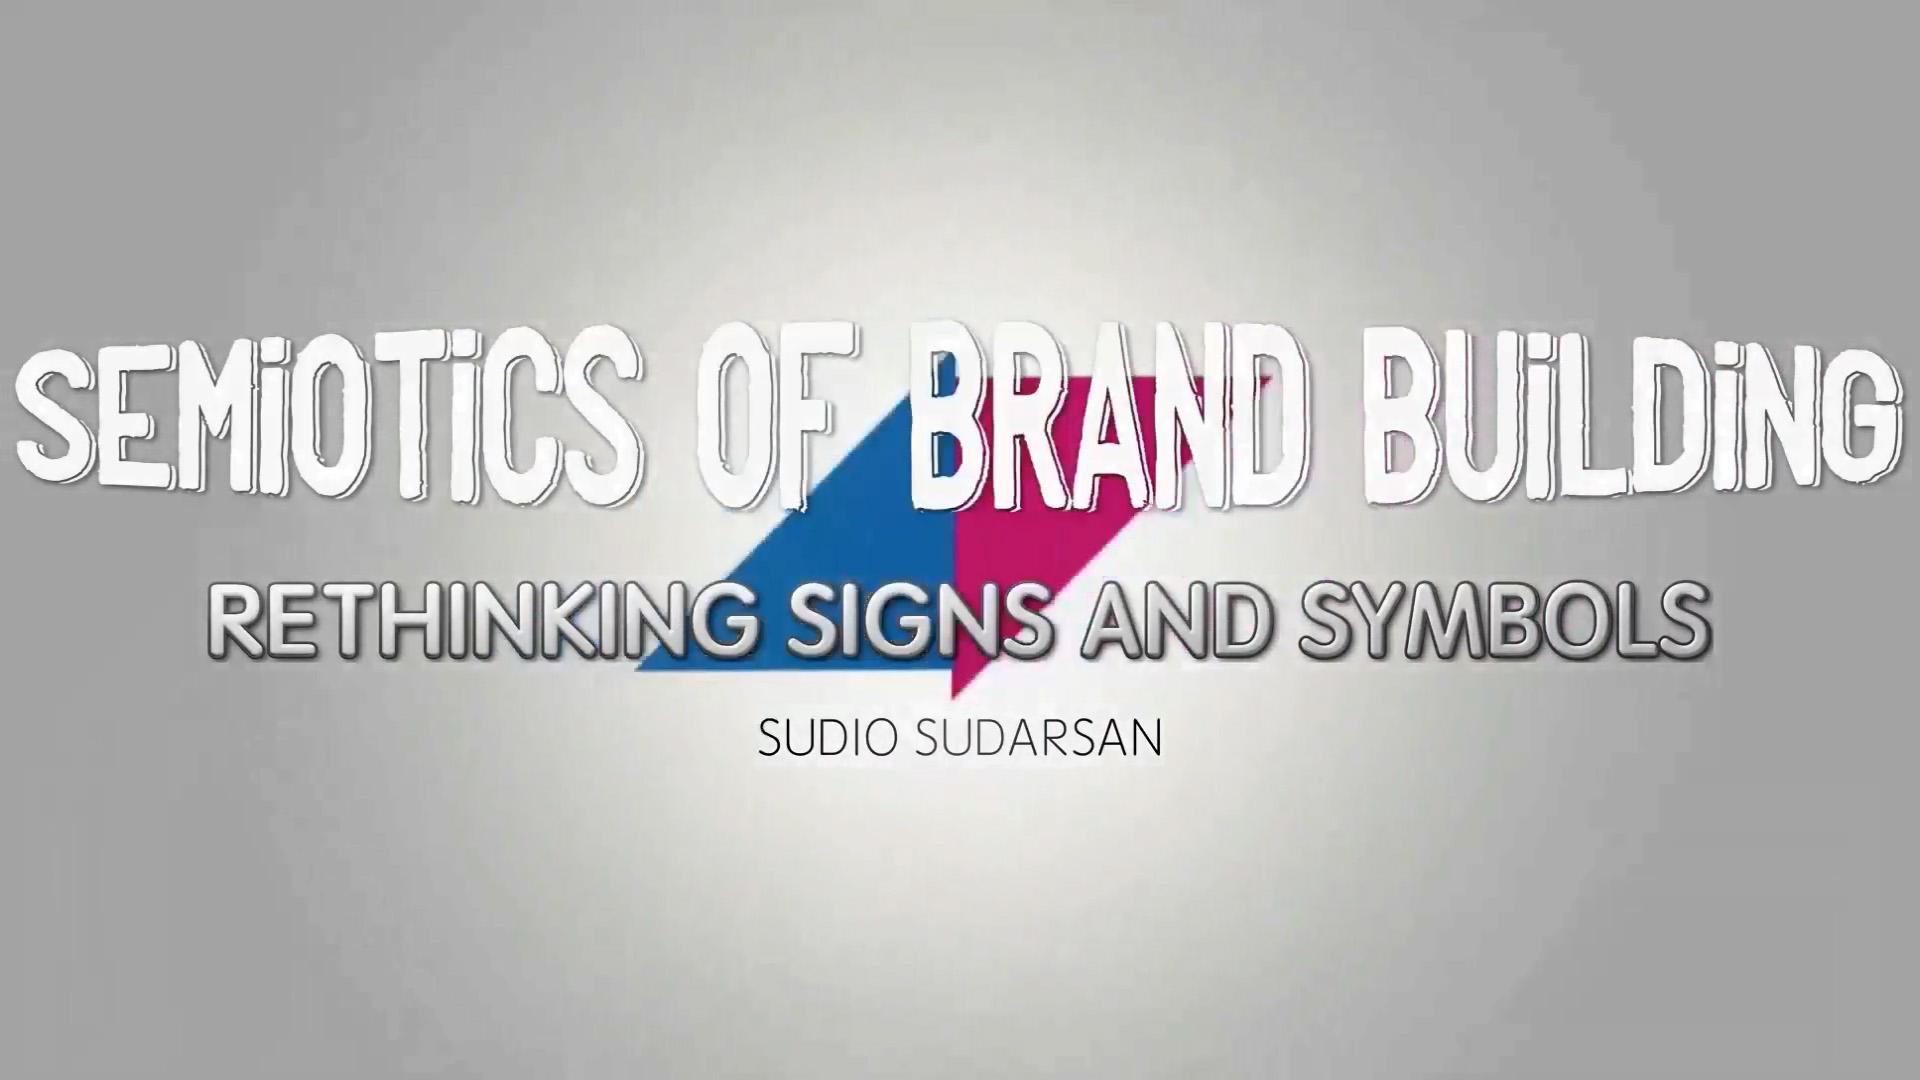 Semiotics and Brand Building: Rethinking Consumer Messaging, Signs, and Symbols